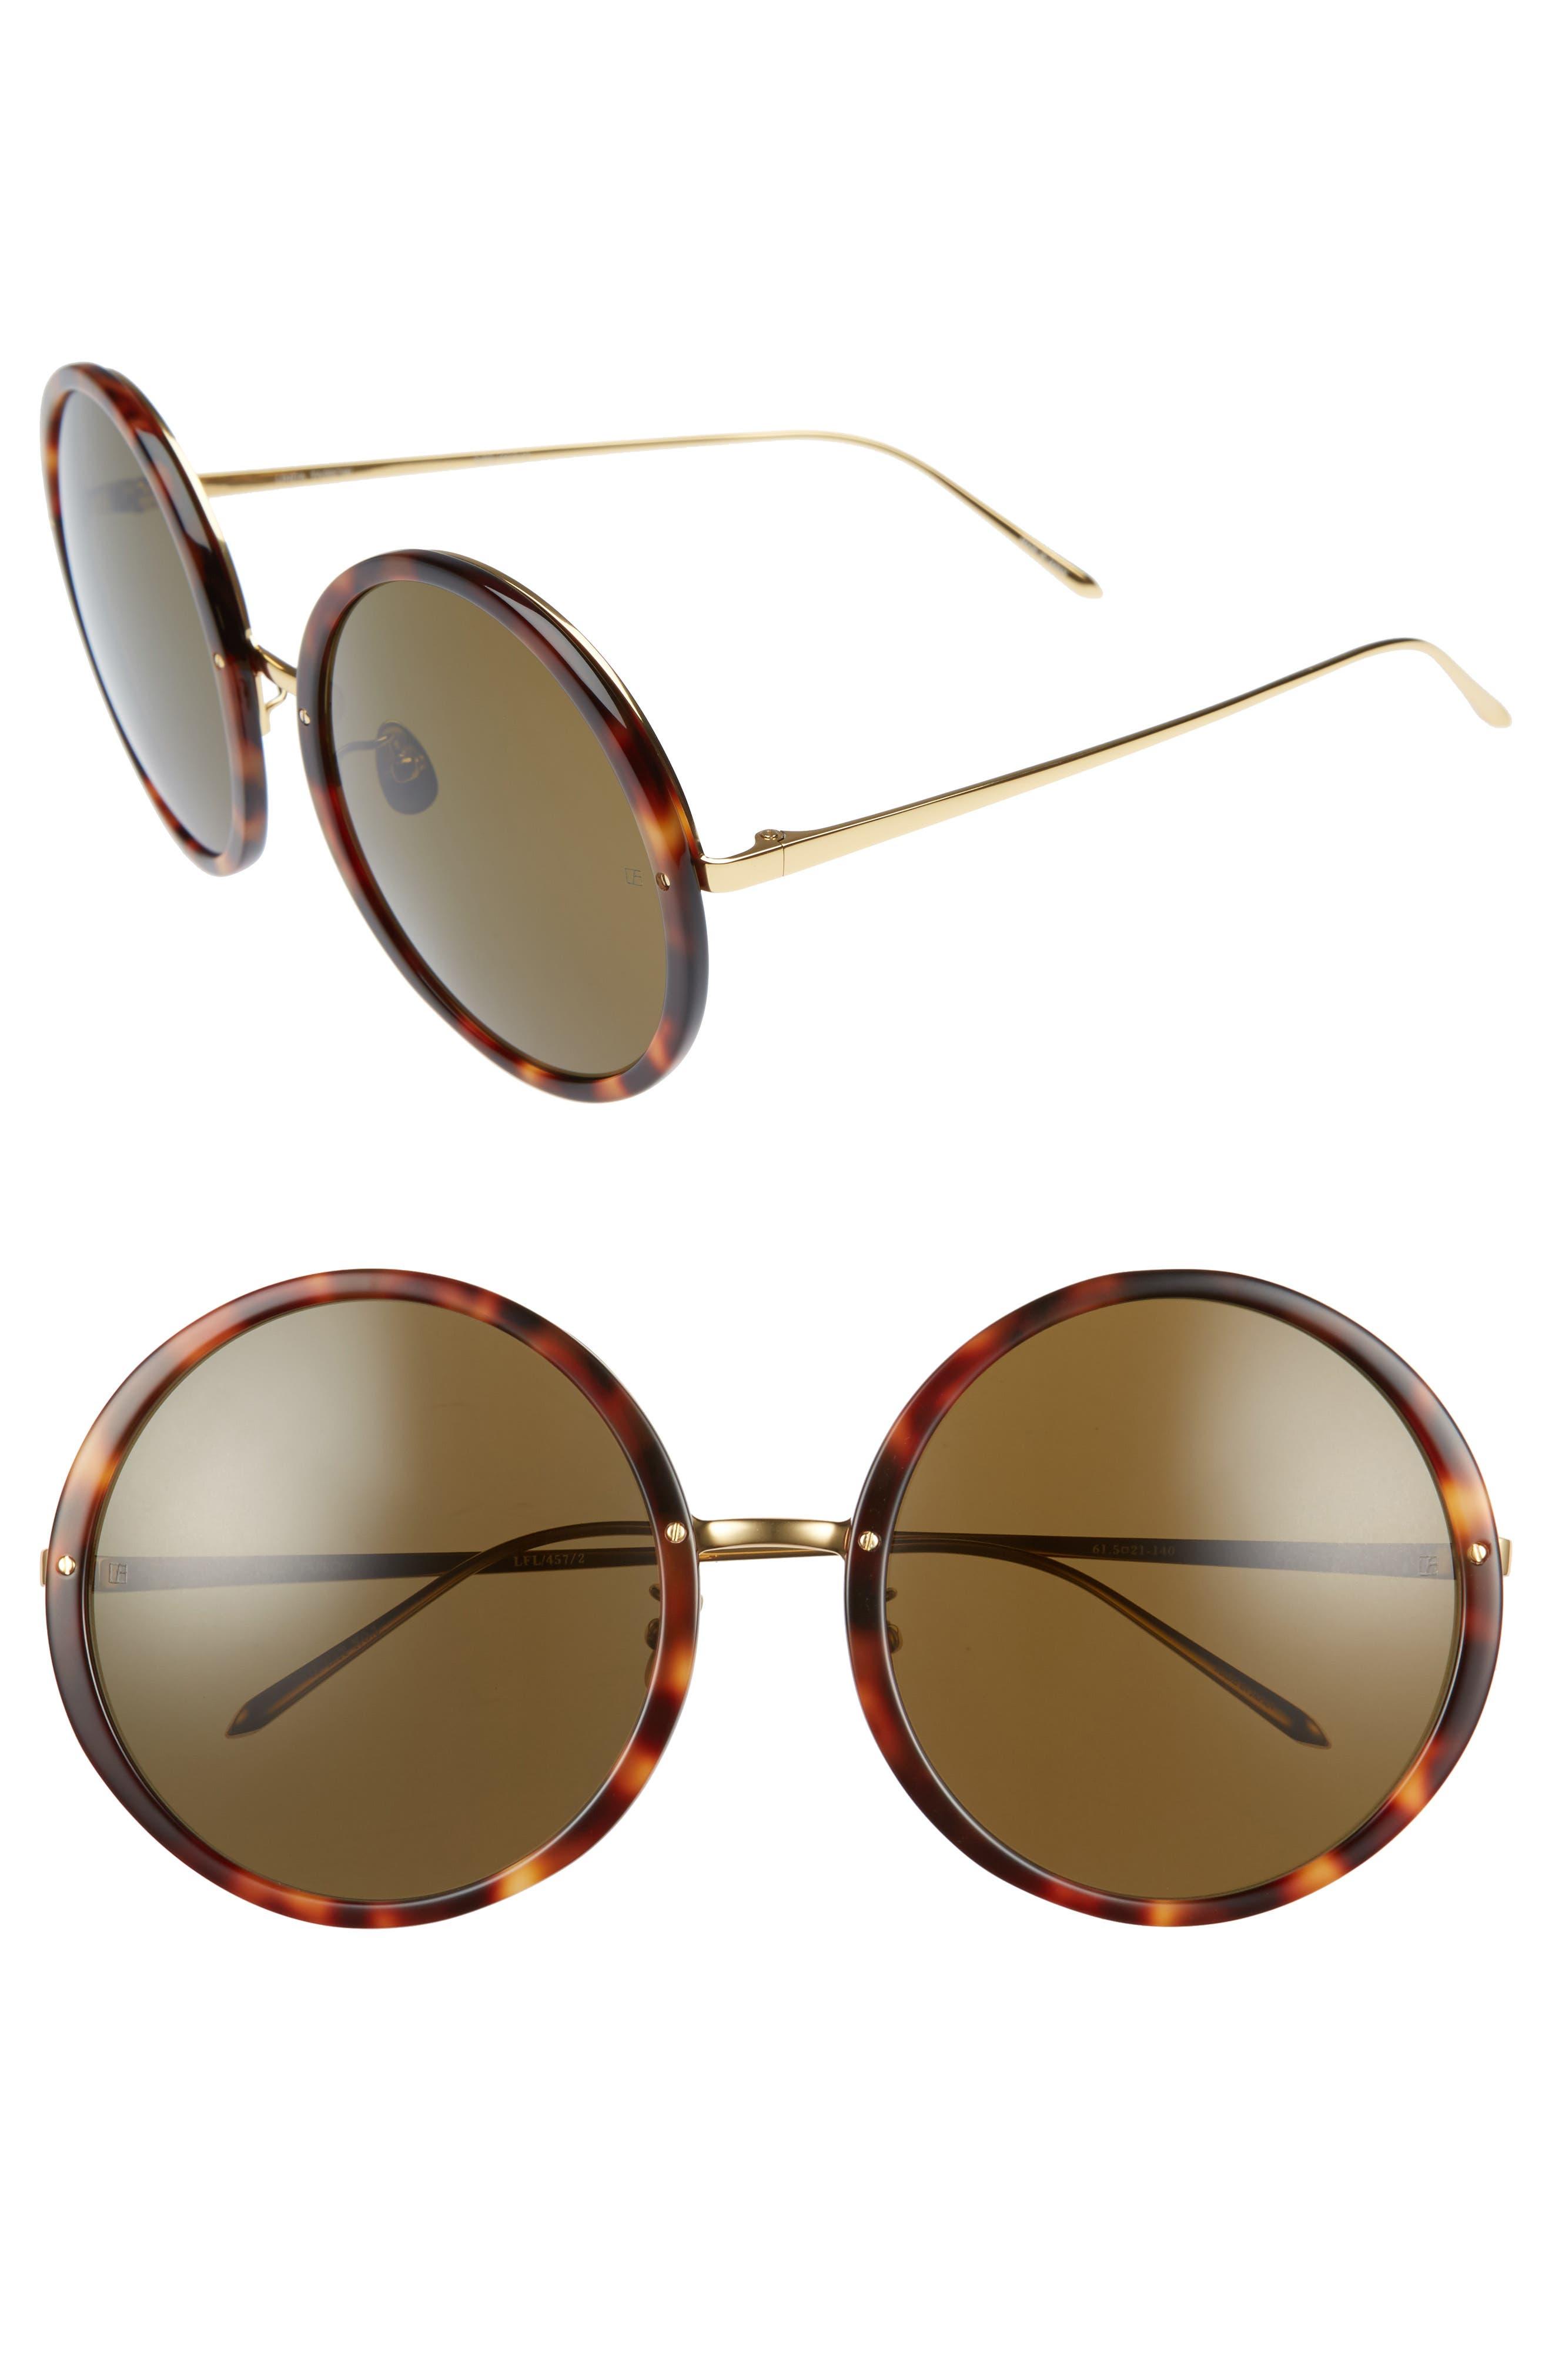 61mm Round 18 Karat Gold Trim Sunglasses,                         Main,                         color, Tortoise/ Yellow Gold/ Brown